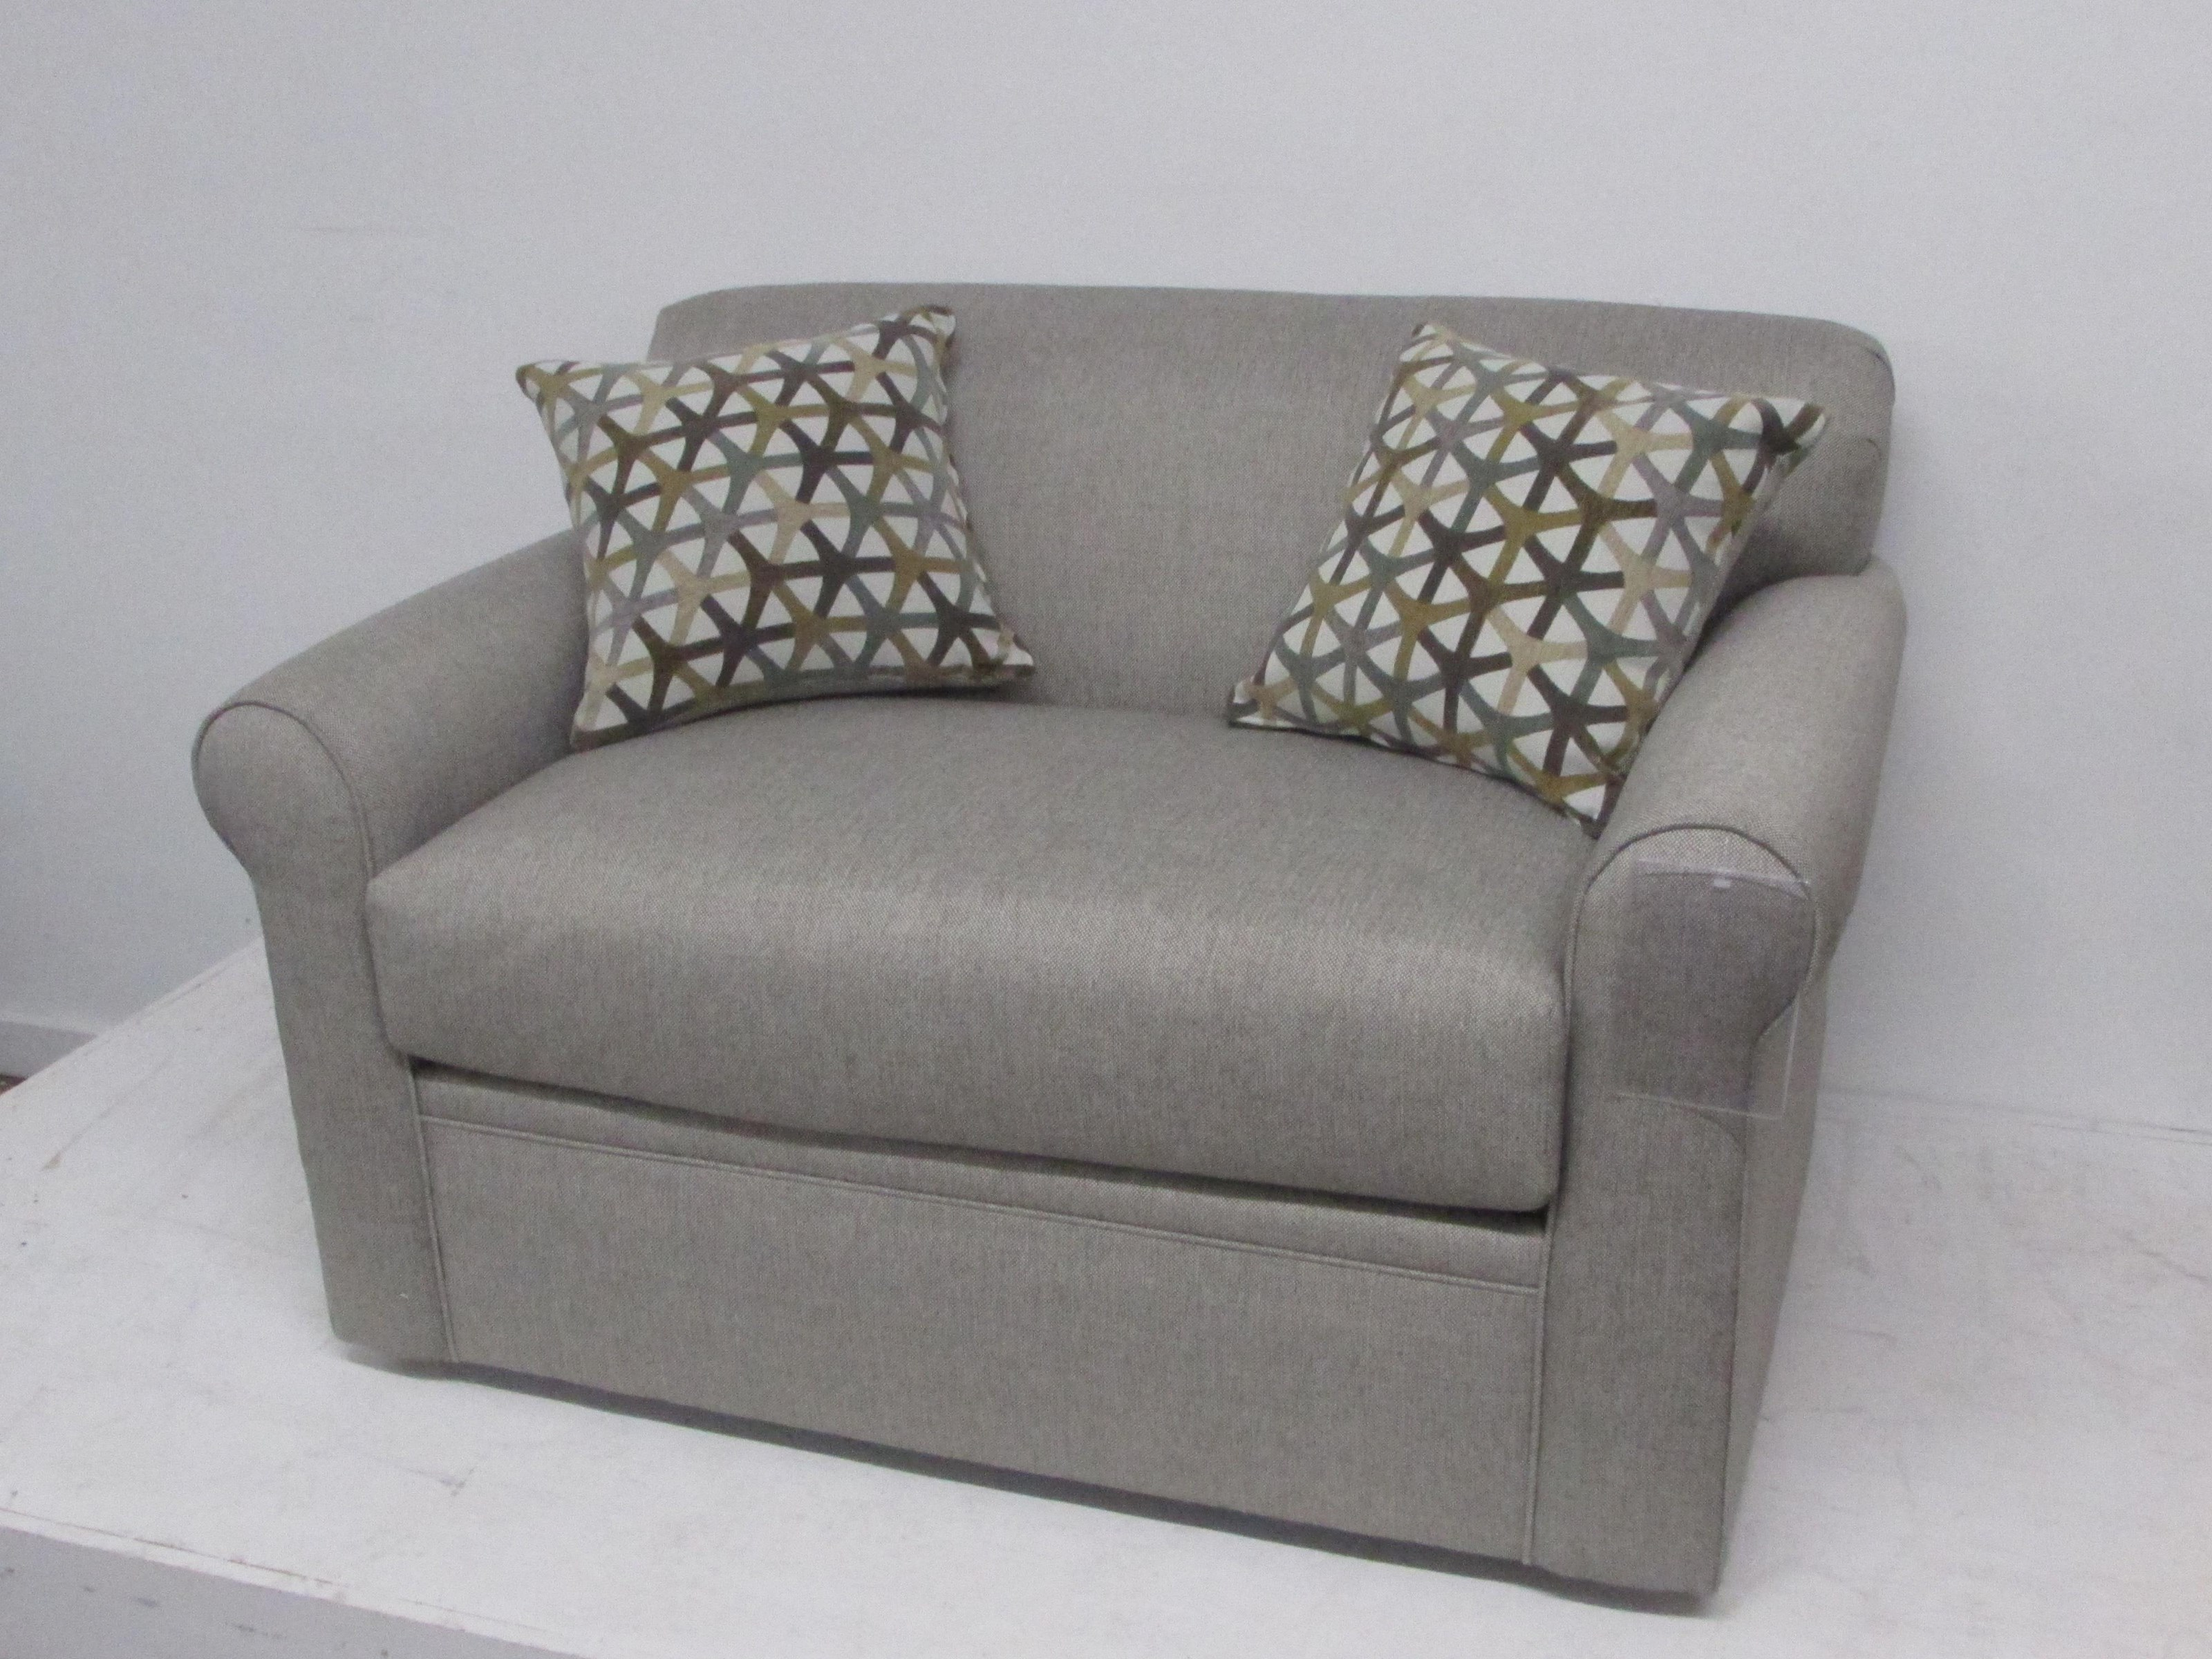 Overnight Sofa 2300 Twin Sleeper Sofa - Item Number: 2333